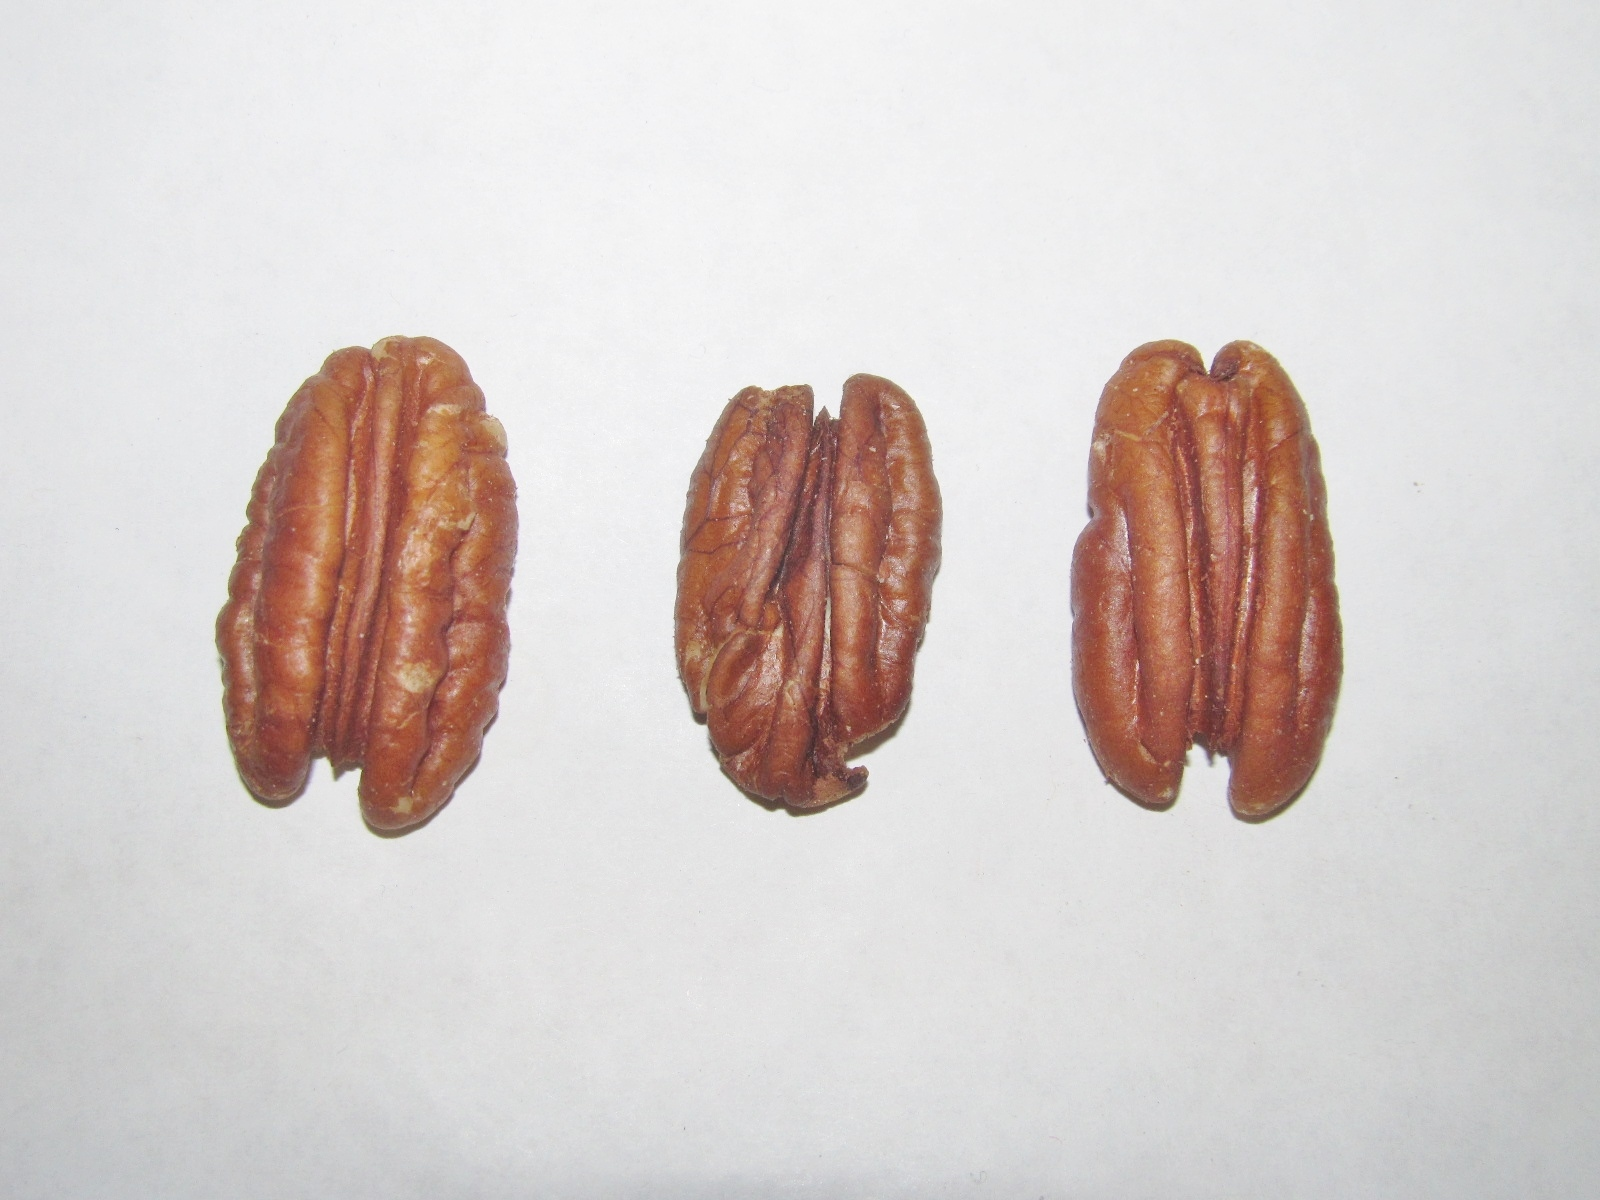 Three Pecans (40748558074).jpg